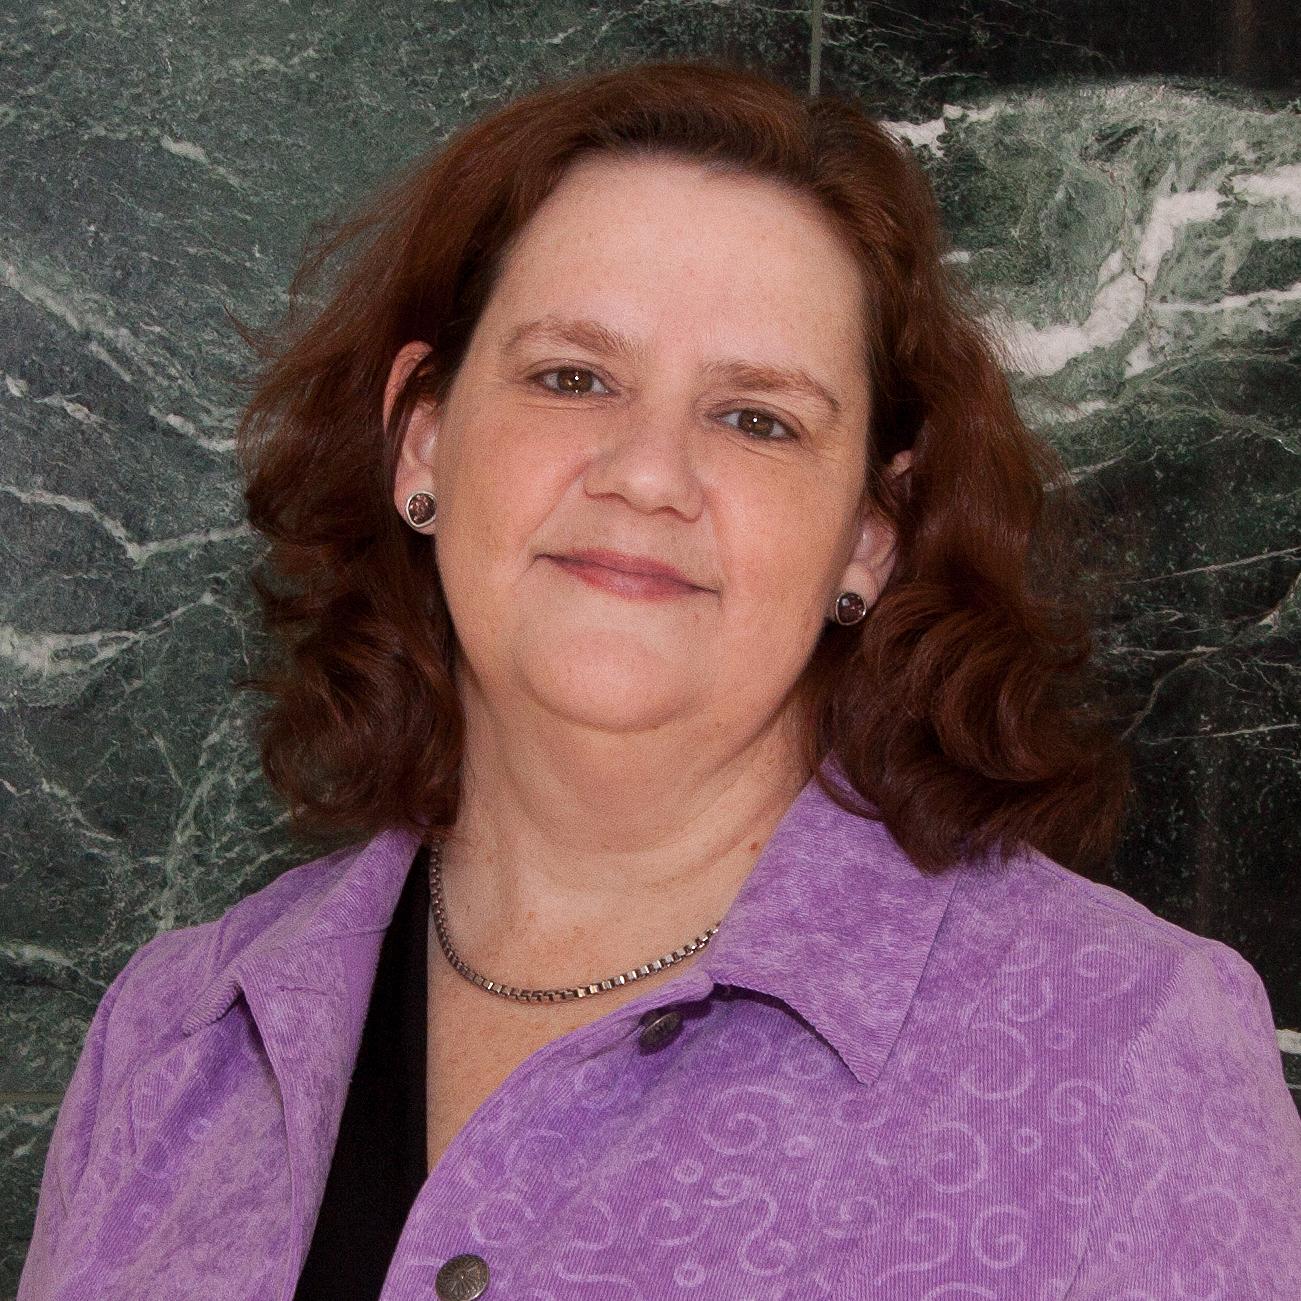 Teresa Peavy